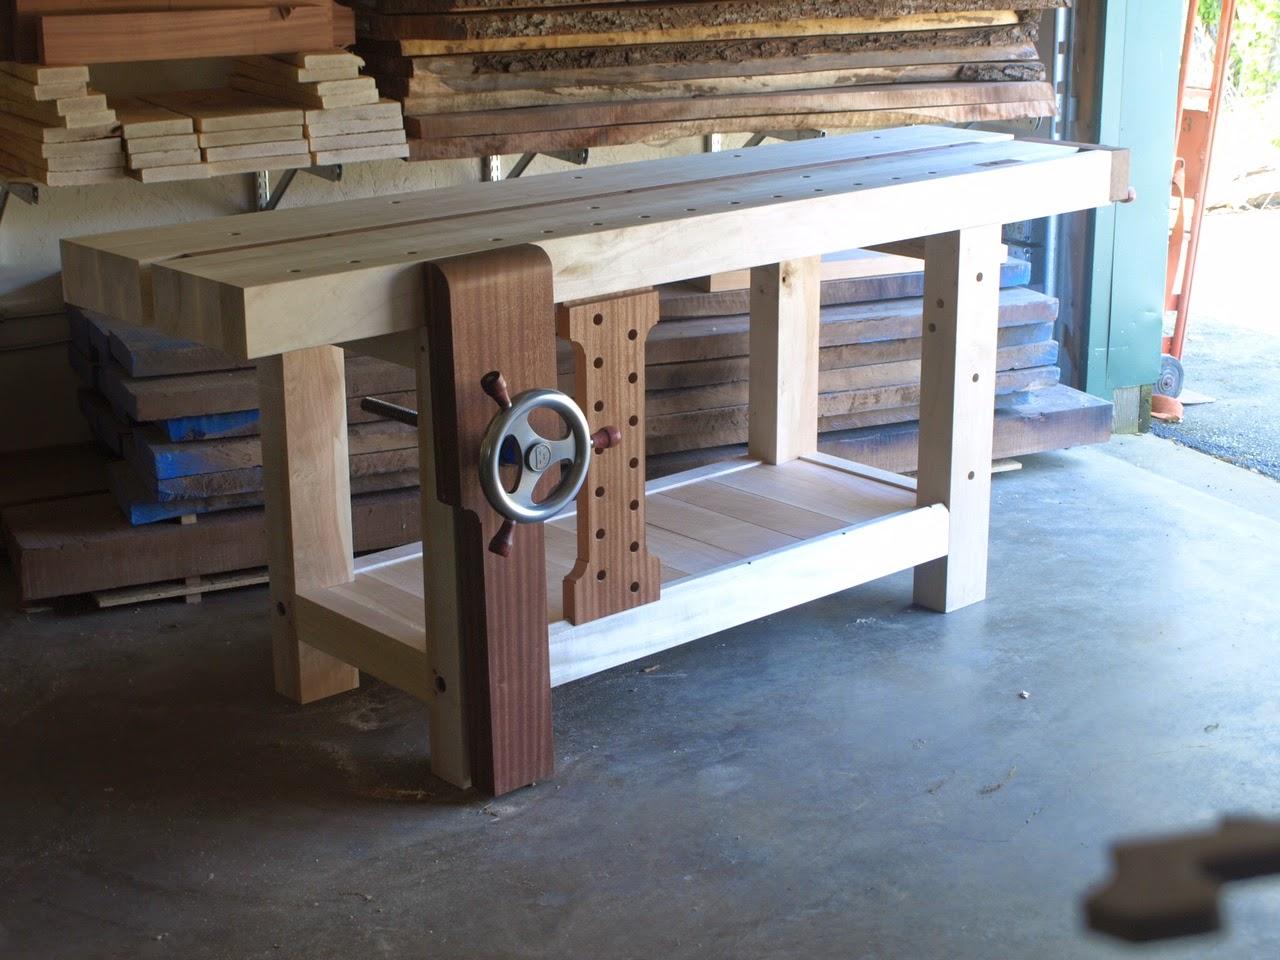 David Barron Furniture Work Benches For Sale At Handworks Next Week